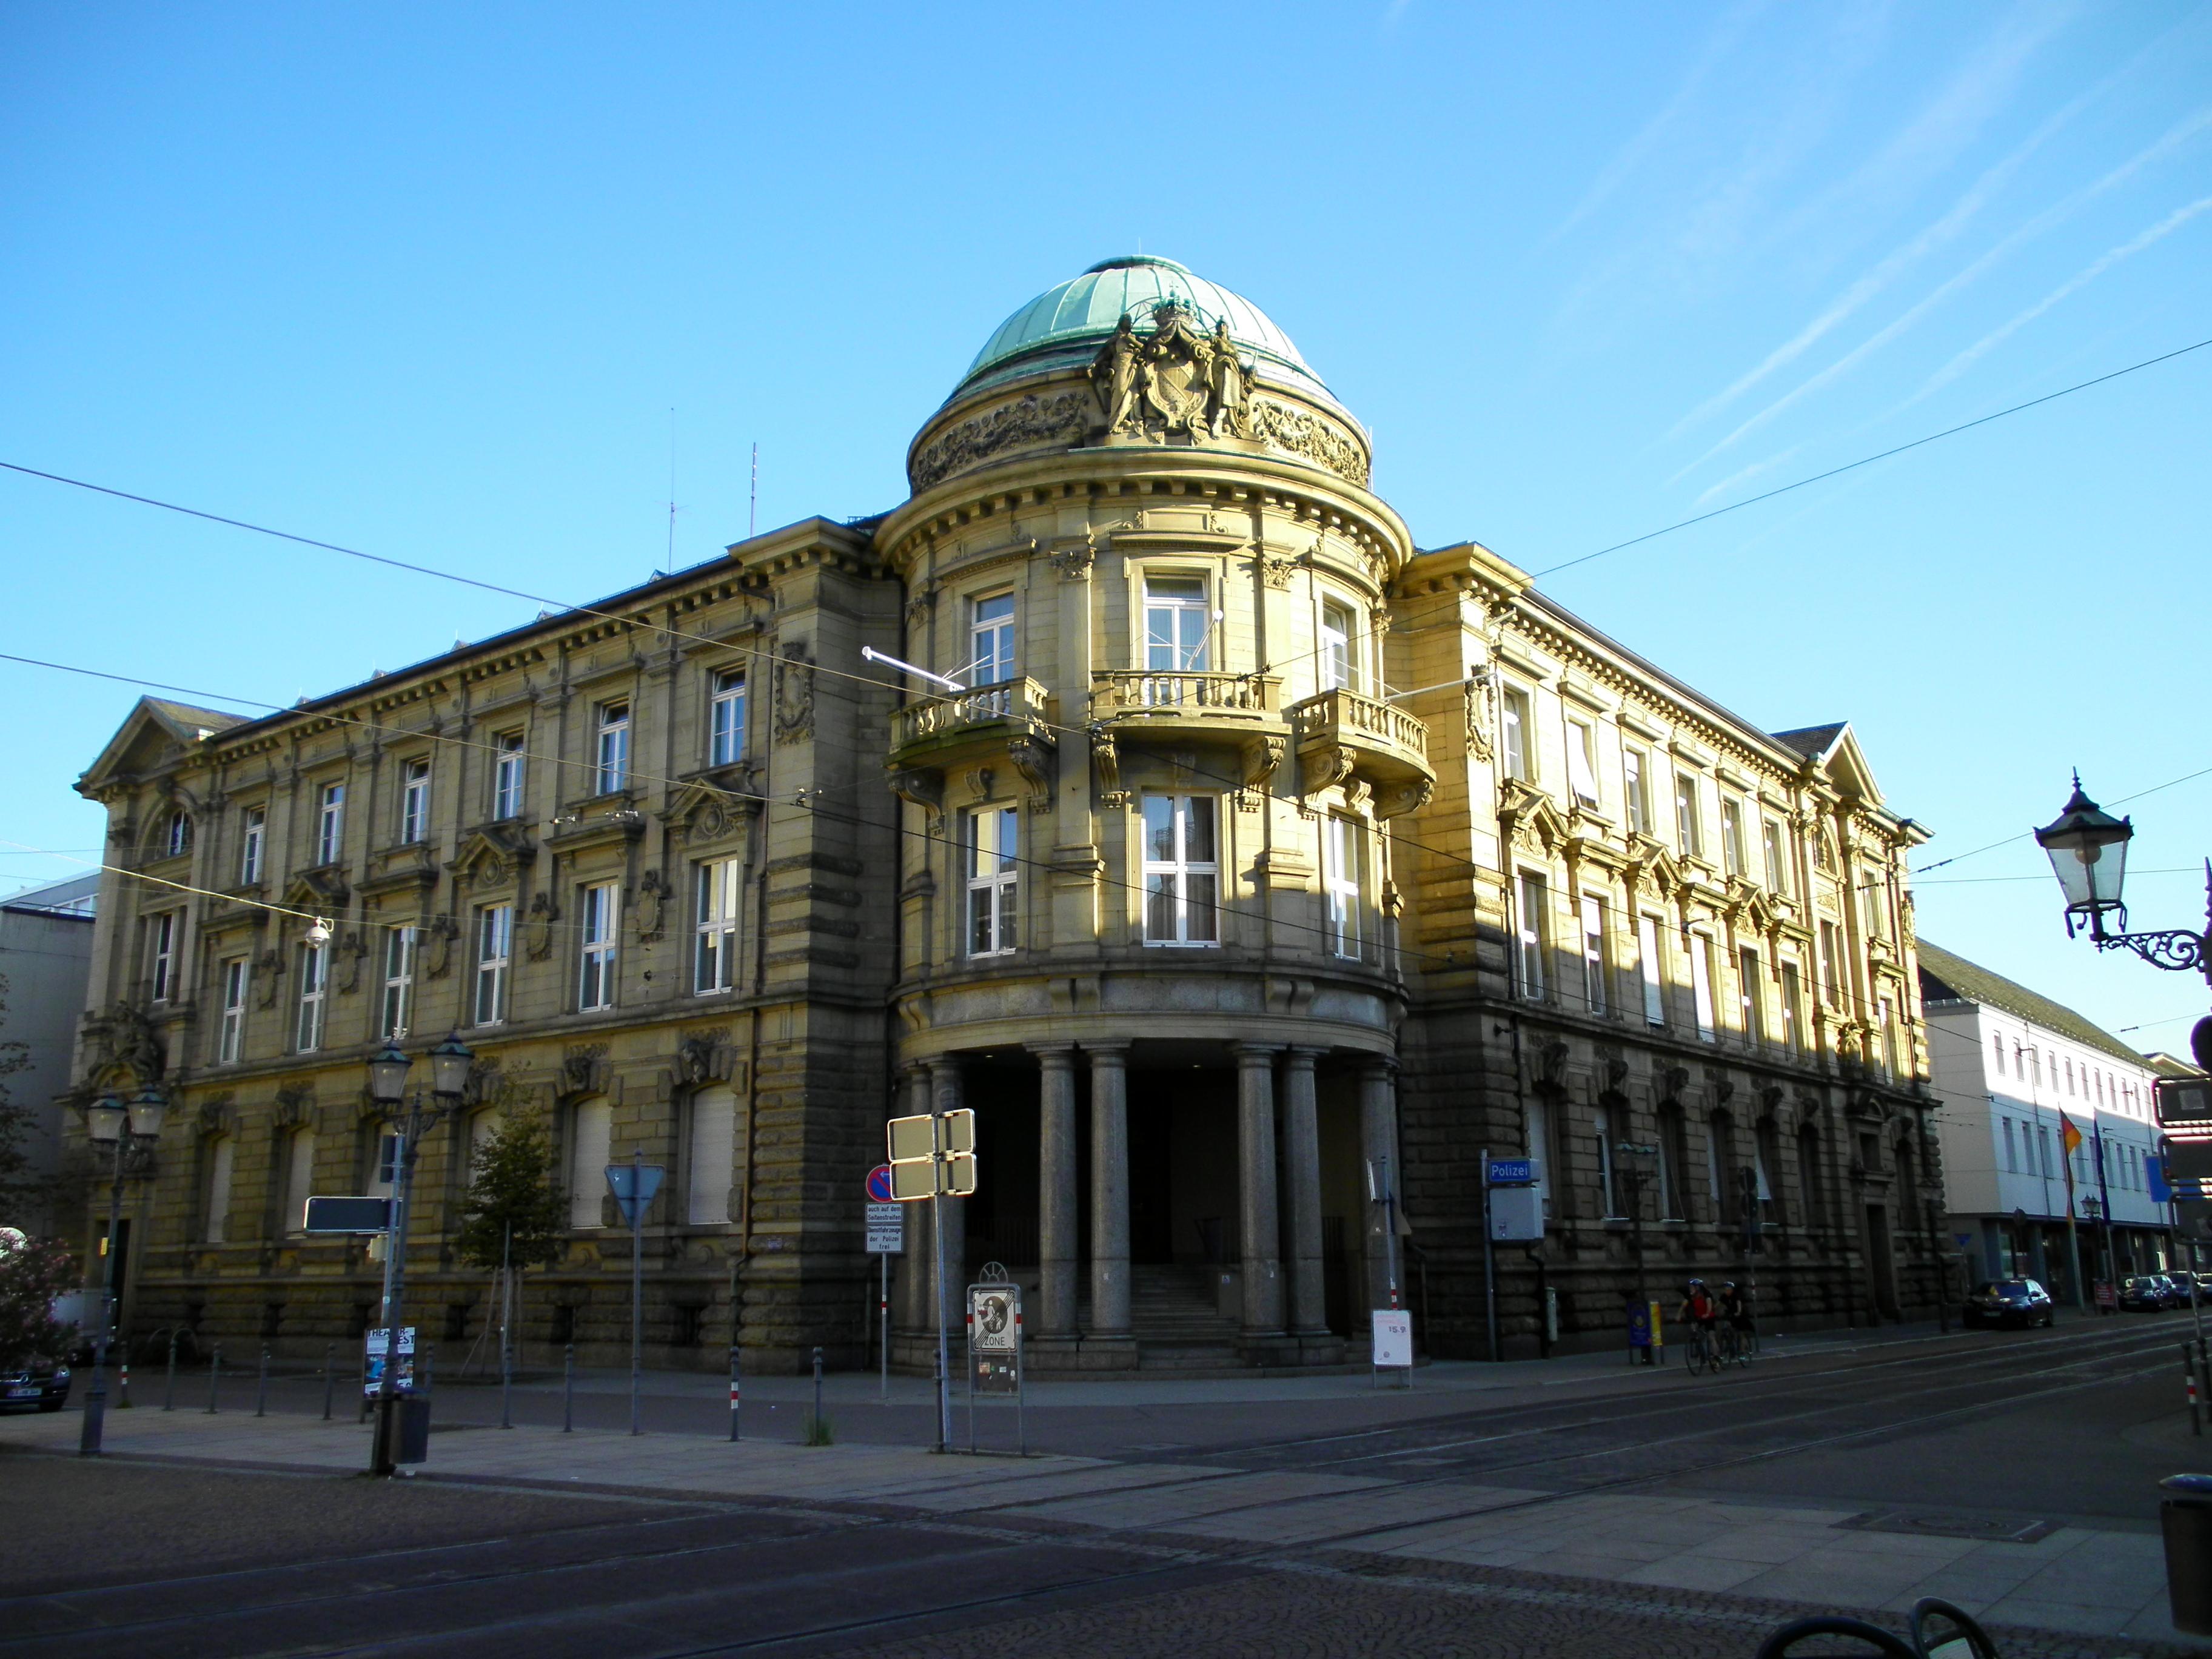 Polizeirevier Karlsruhe-Marktplatz Karlsruhe